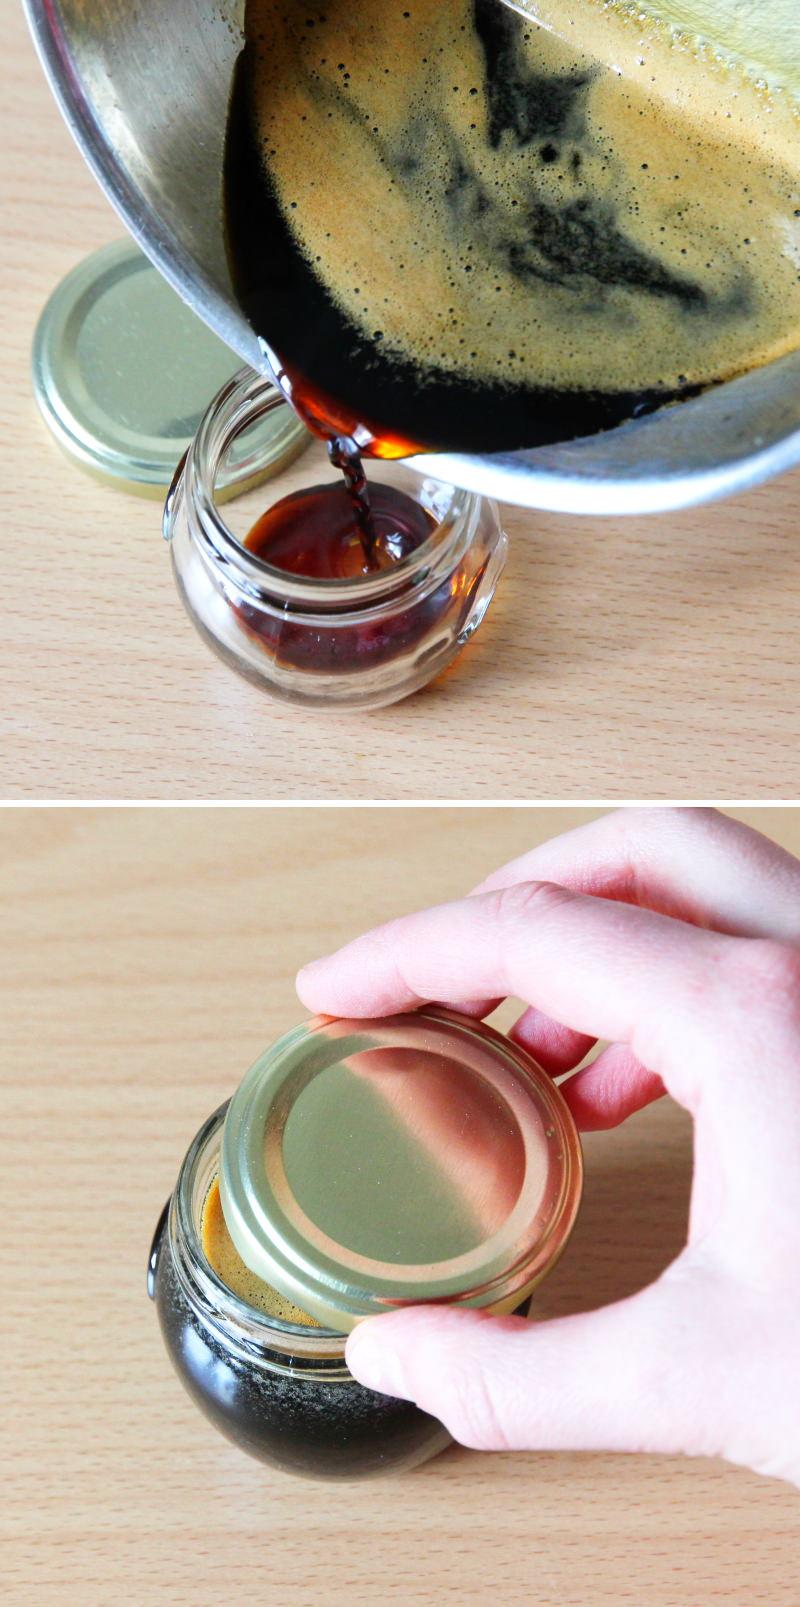 Teriyaki Sauce Schritt 4 Abfüllen